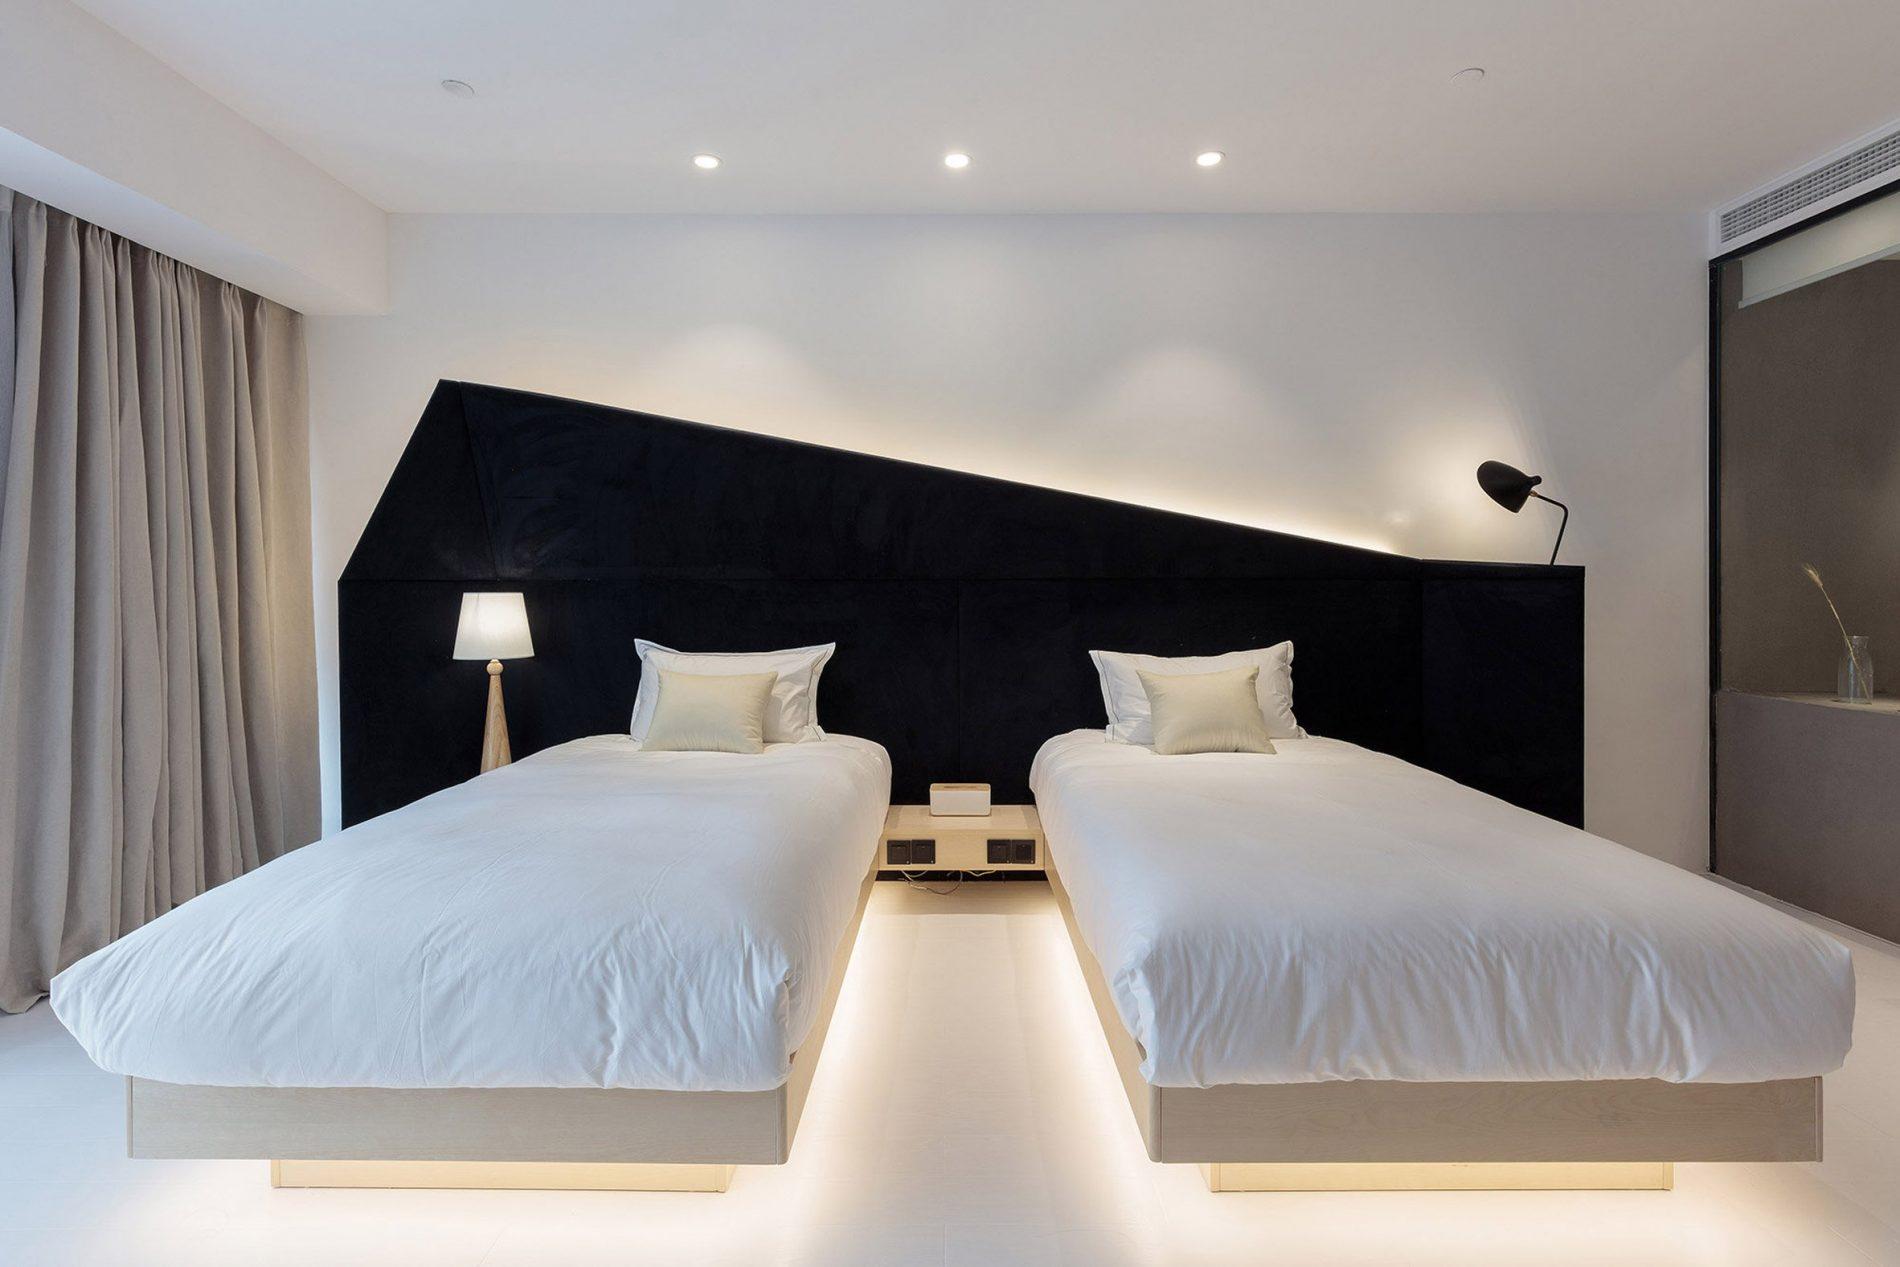 bedroom design trends. Bedroom Design Trends. 19. Wheat Youth Arts Hotel\\u2013 Hangzhou, China Trends G